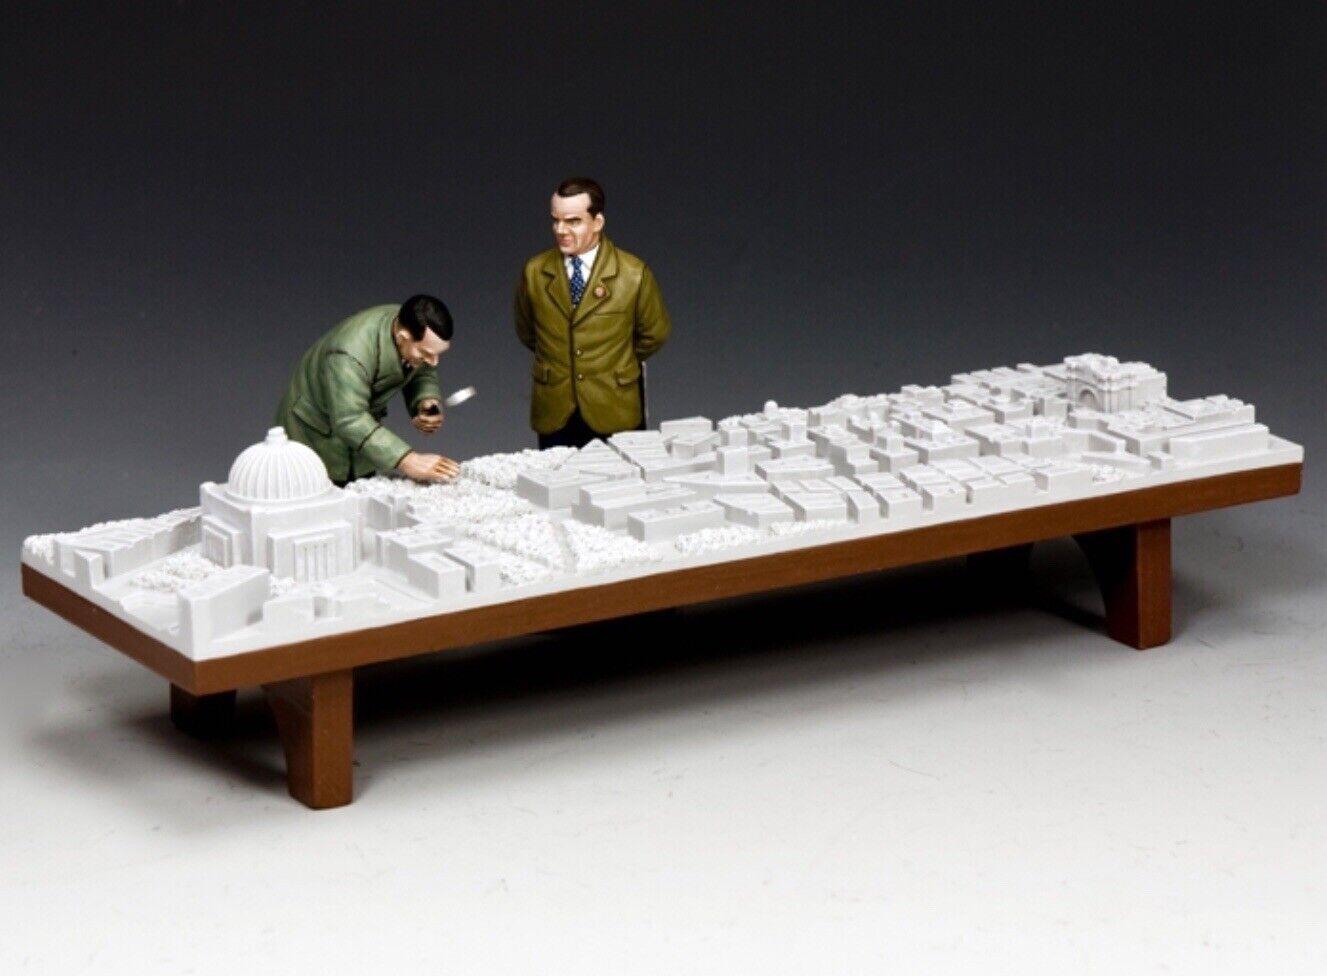 LAH193 WW2 Inspecting Germania Set Mint In Box LAH 193 193